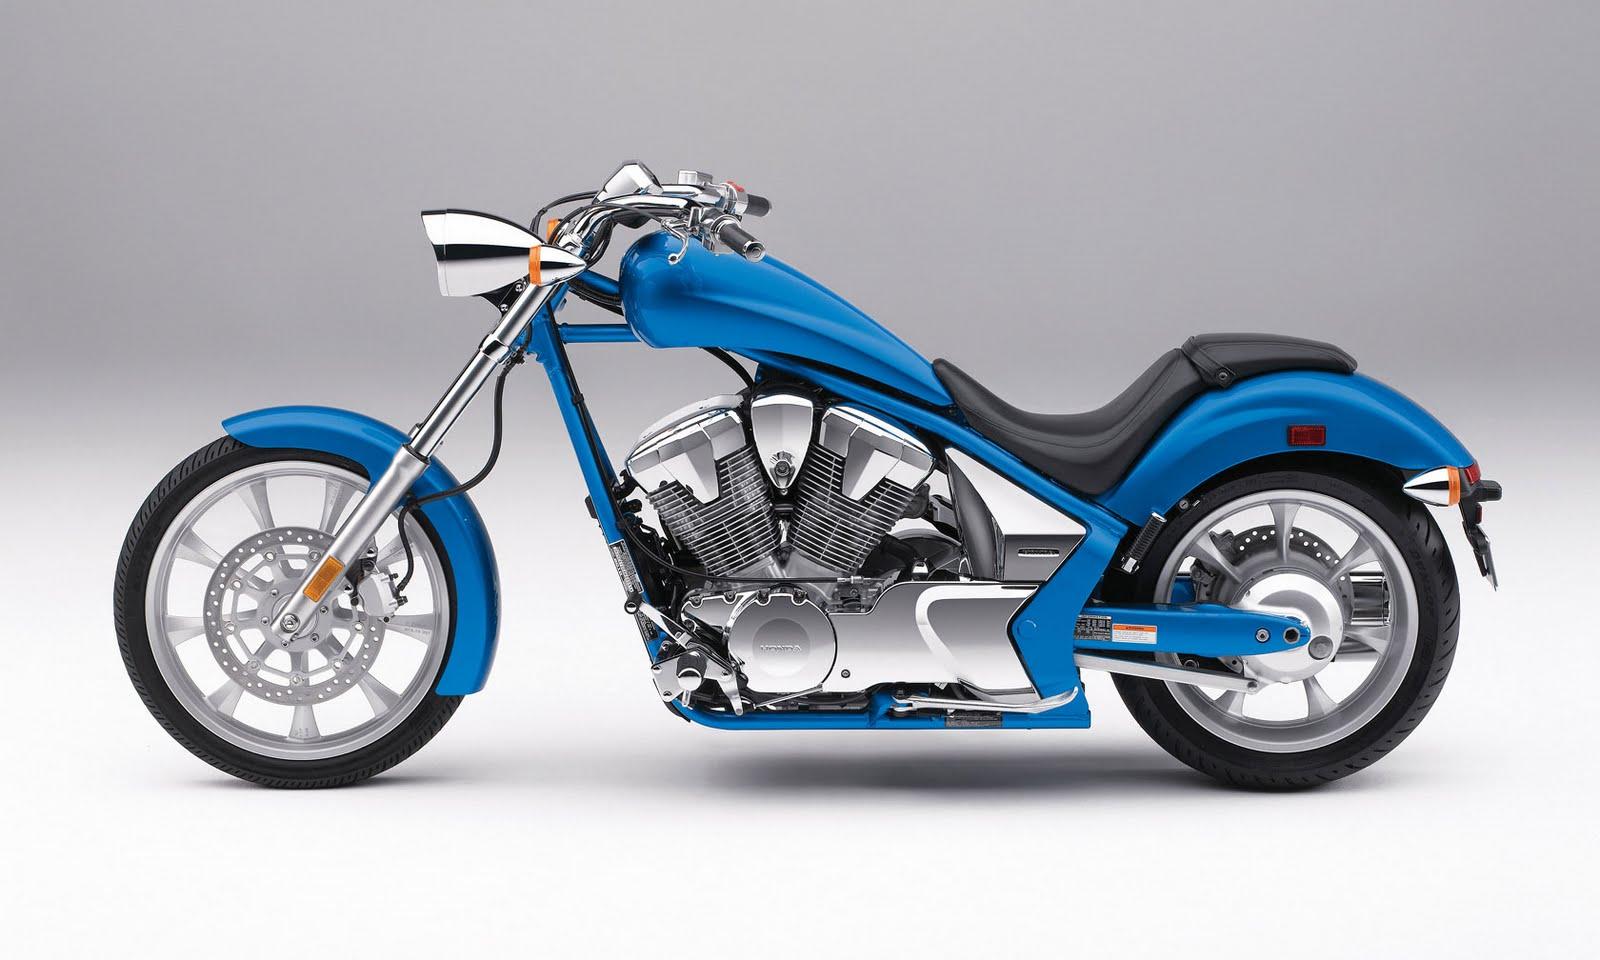 Top Motorcycle Amp Review 2010 Honda Fury